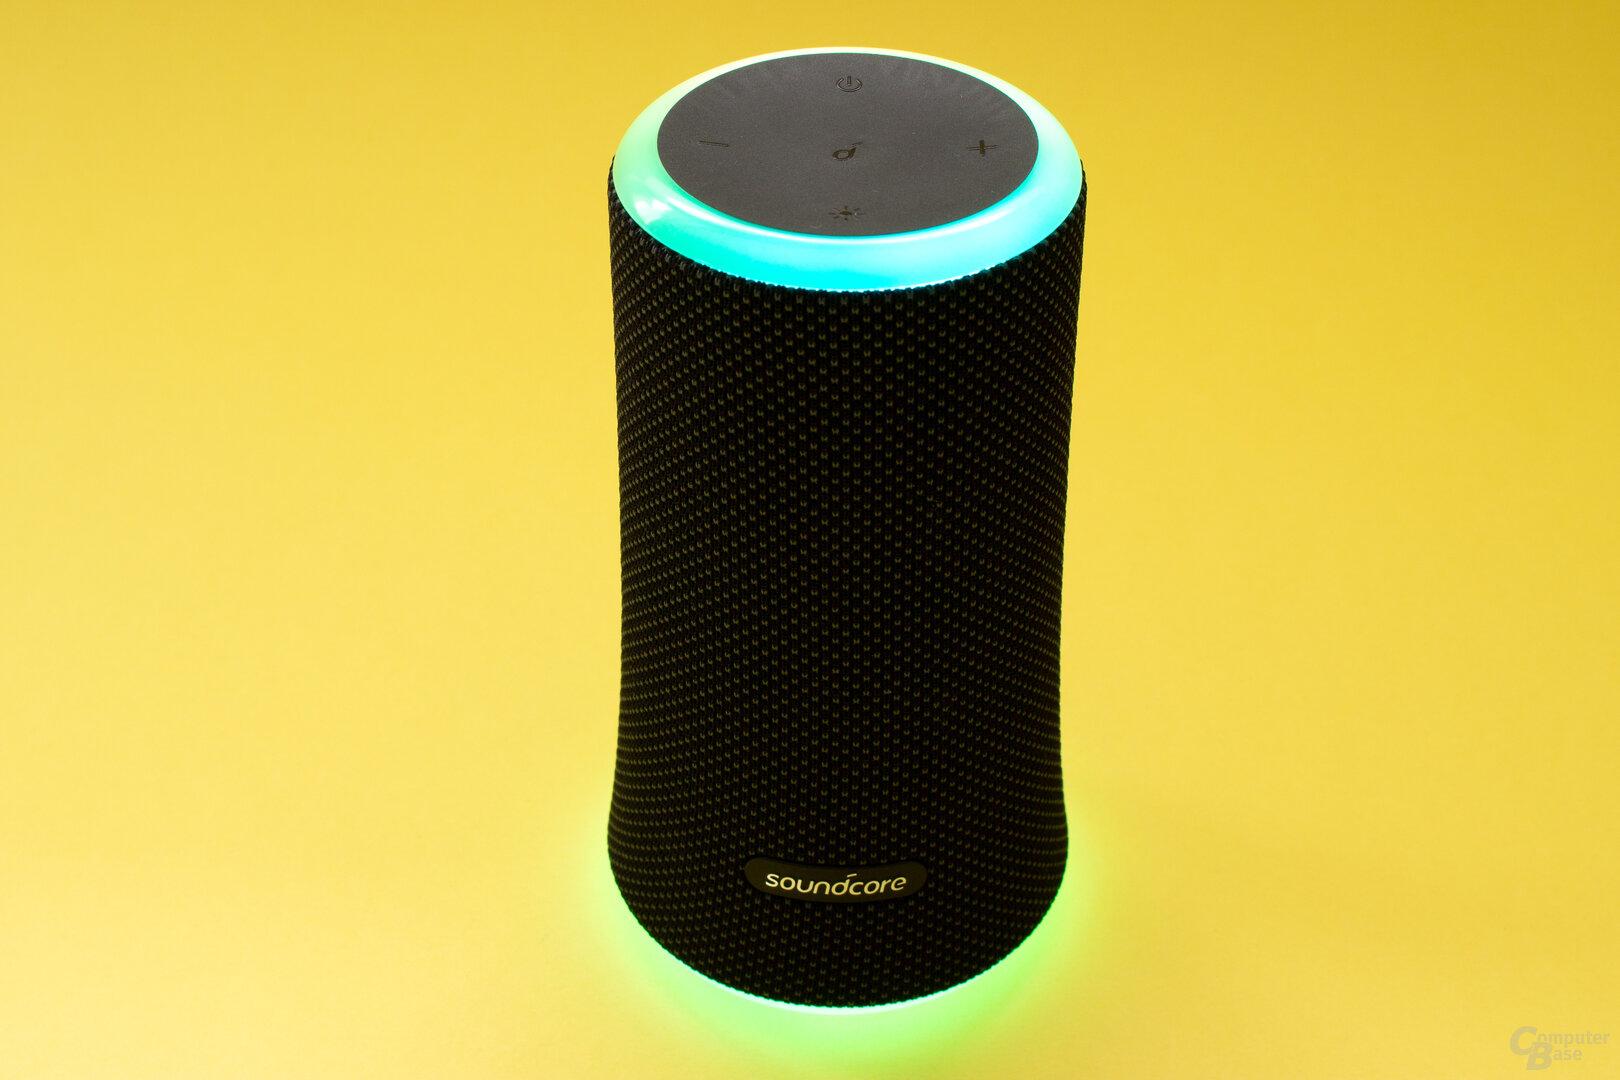 Der Soundcore Flare 2 besitzt nun zwei LED-Ringe